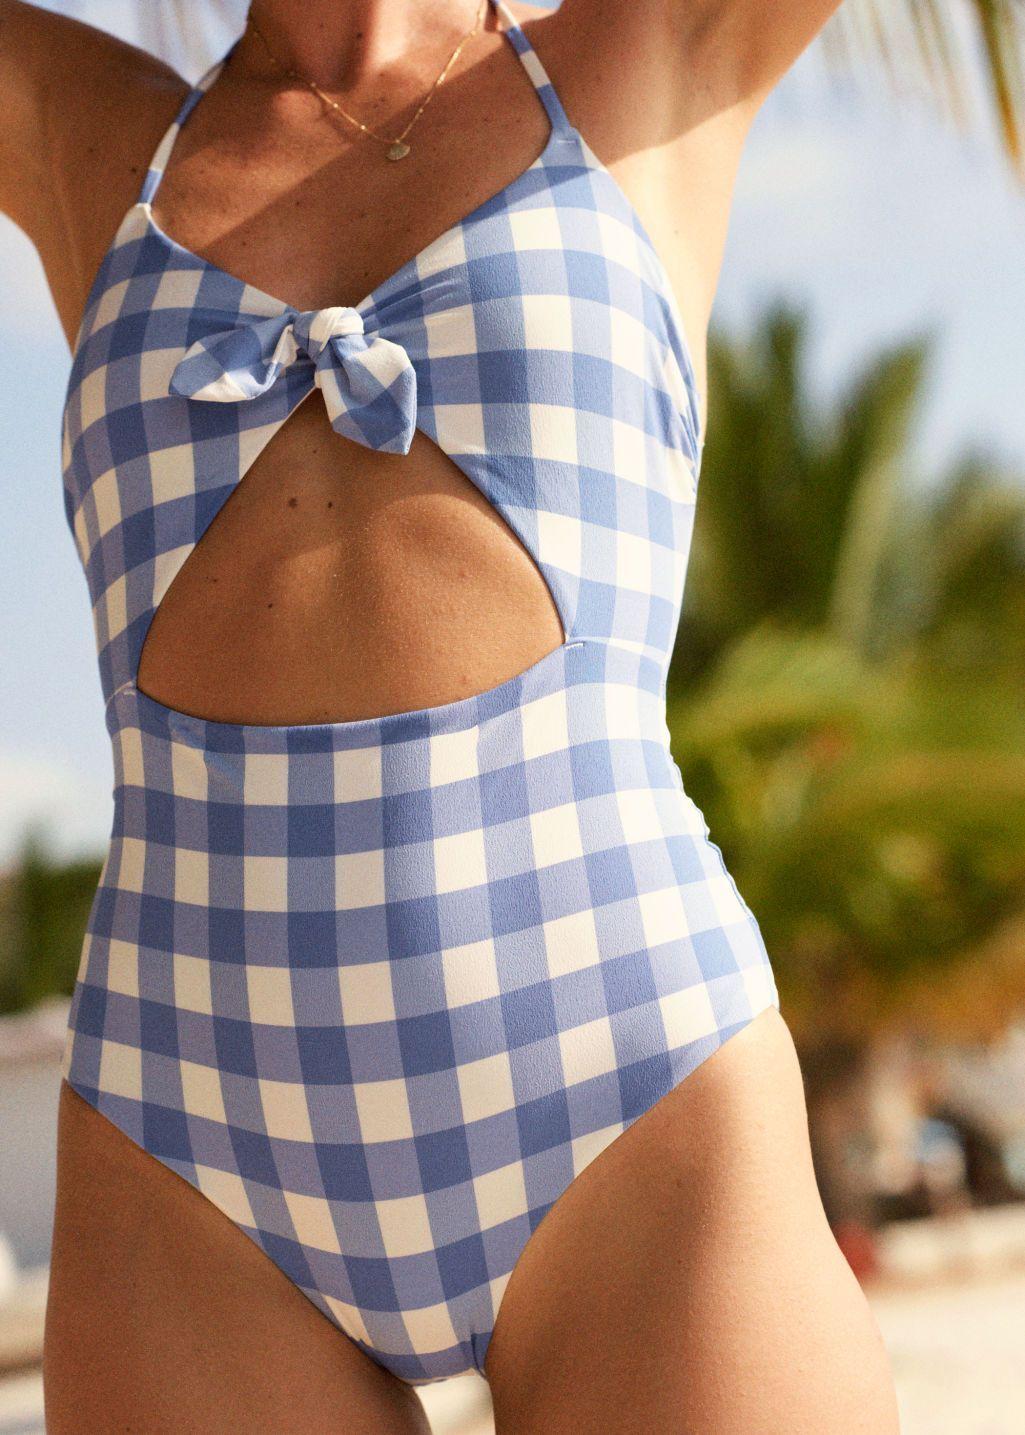 Gingham Cutout Halter Swimsuit Cute Swimsuits Cutout Gingham Halter Swimsuit In 2020 Swimsuits Halter Swimwear Yellow Swimsuits